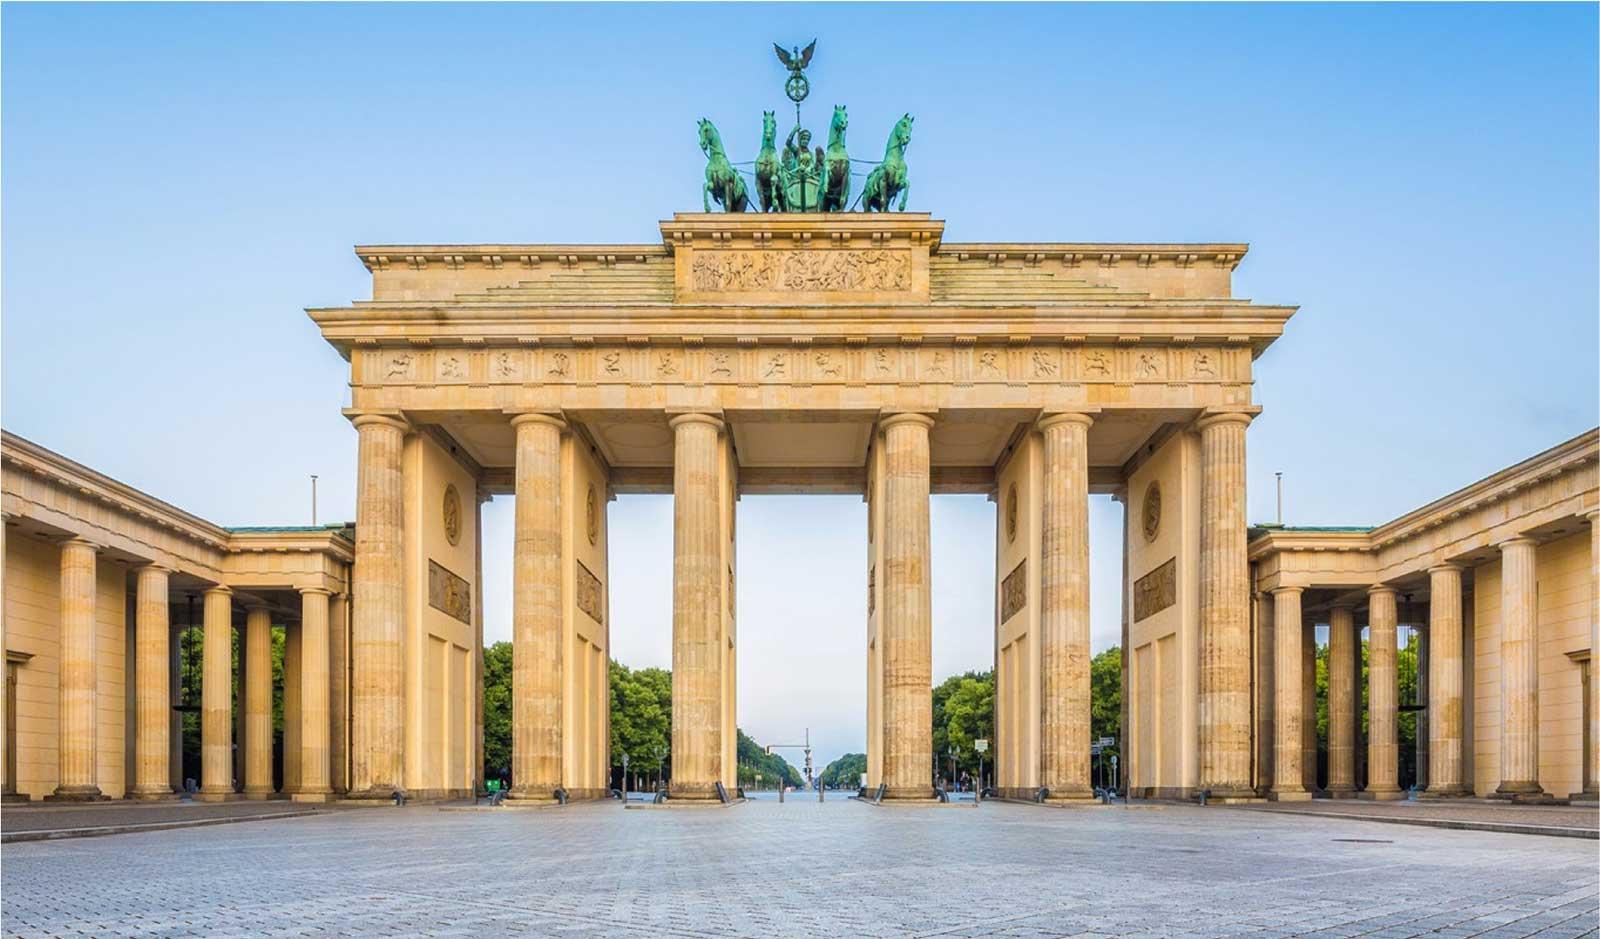 Berlin Marathon city landscape